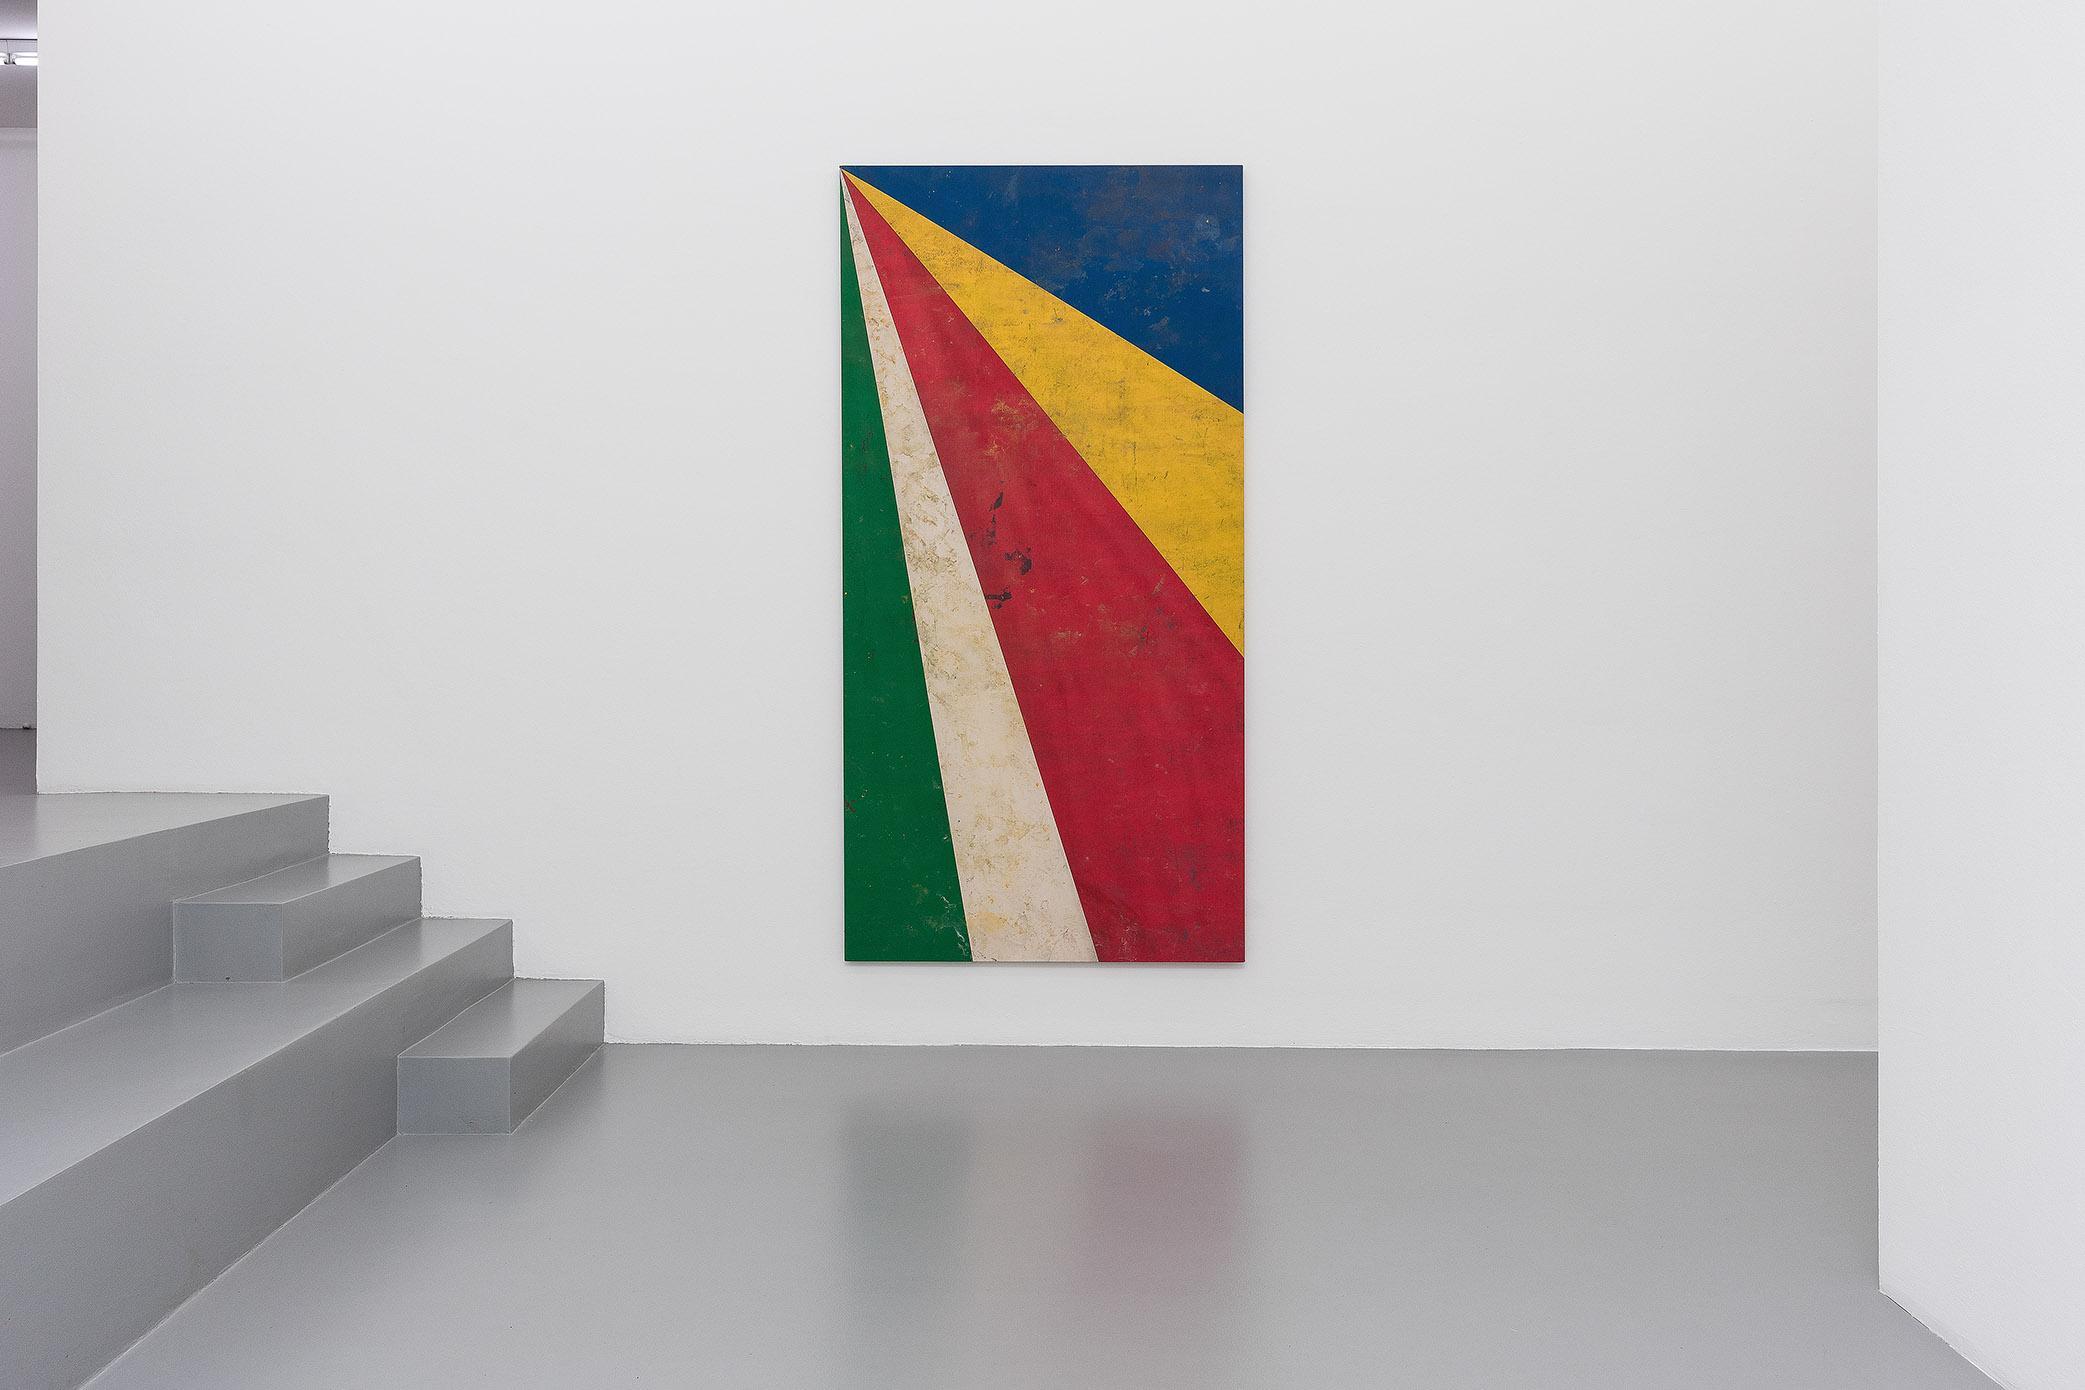 Fredrik Værslev - World Paintings